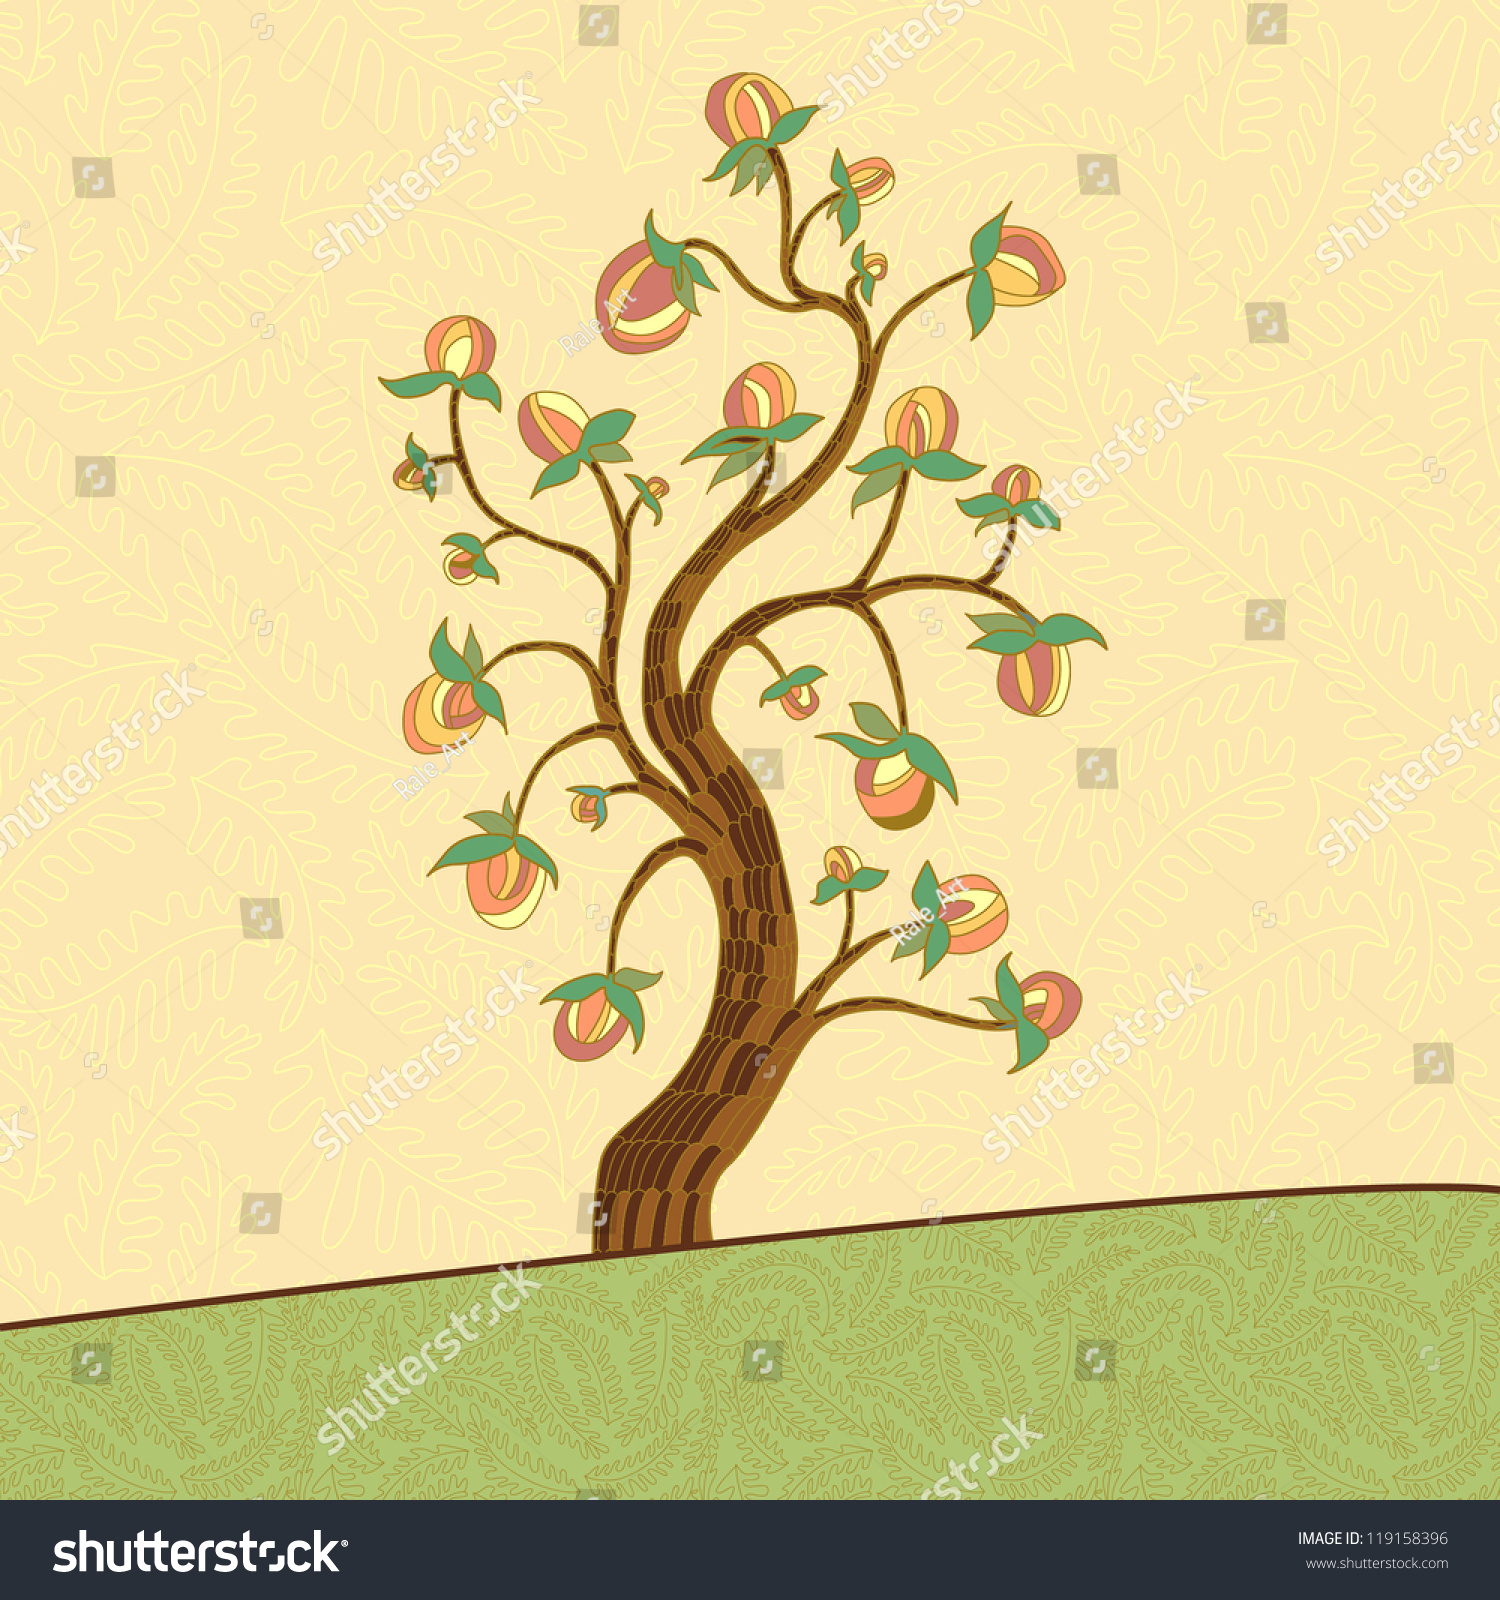 Peach tree vector illustration stock vector 119158396 for Peach tree designs